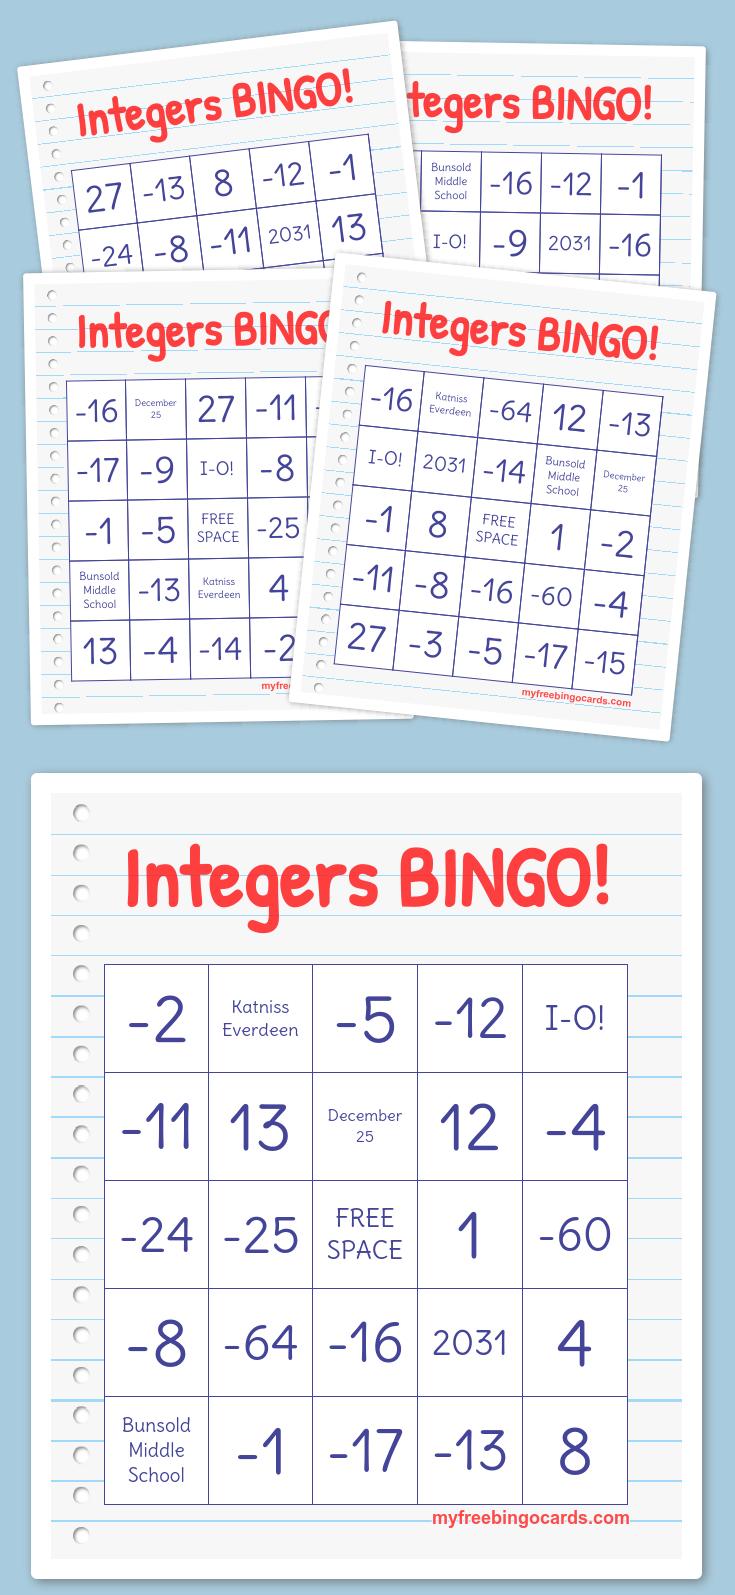 Integers Bingo! | Free Printable Bingo Cards, Bingo Card